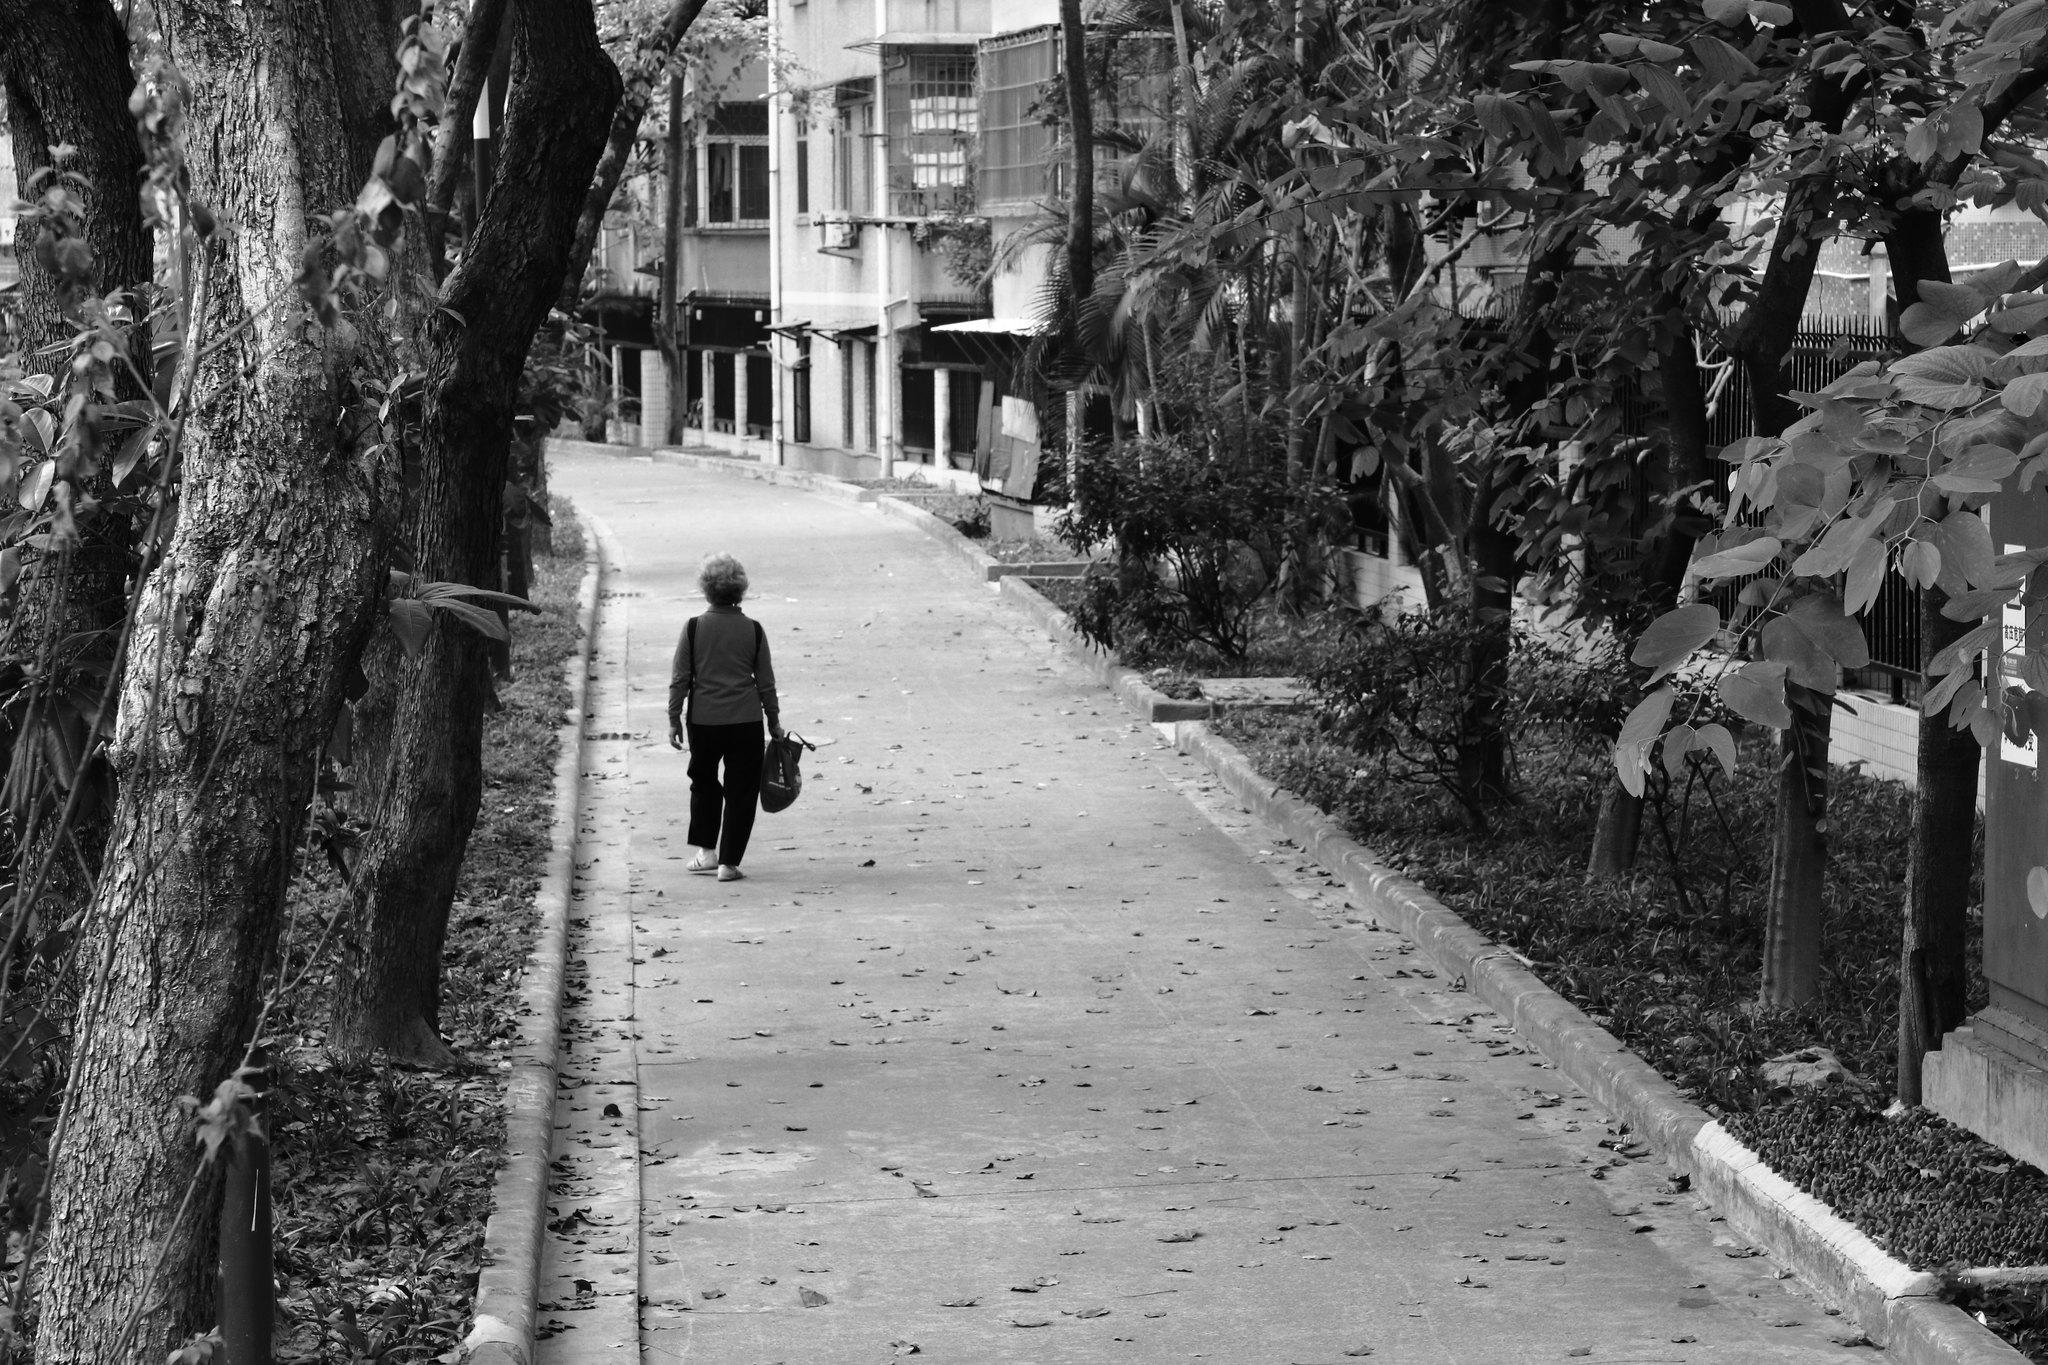 IMG_0879 The walk